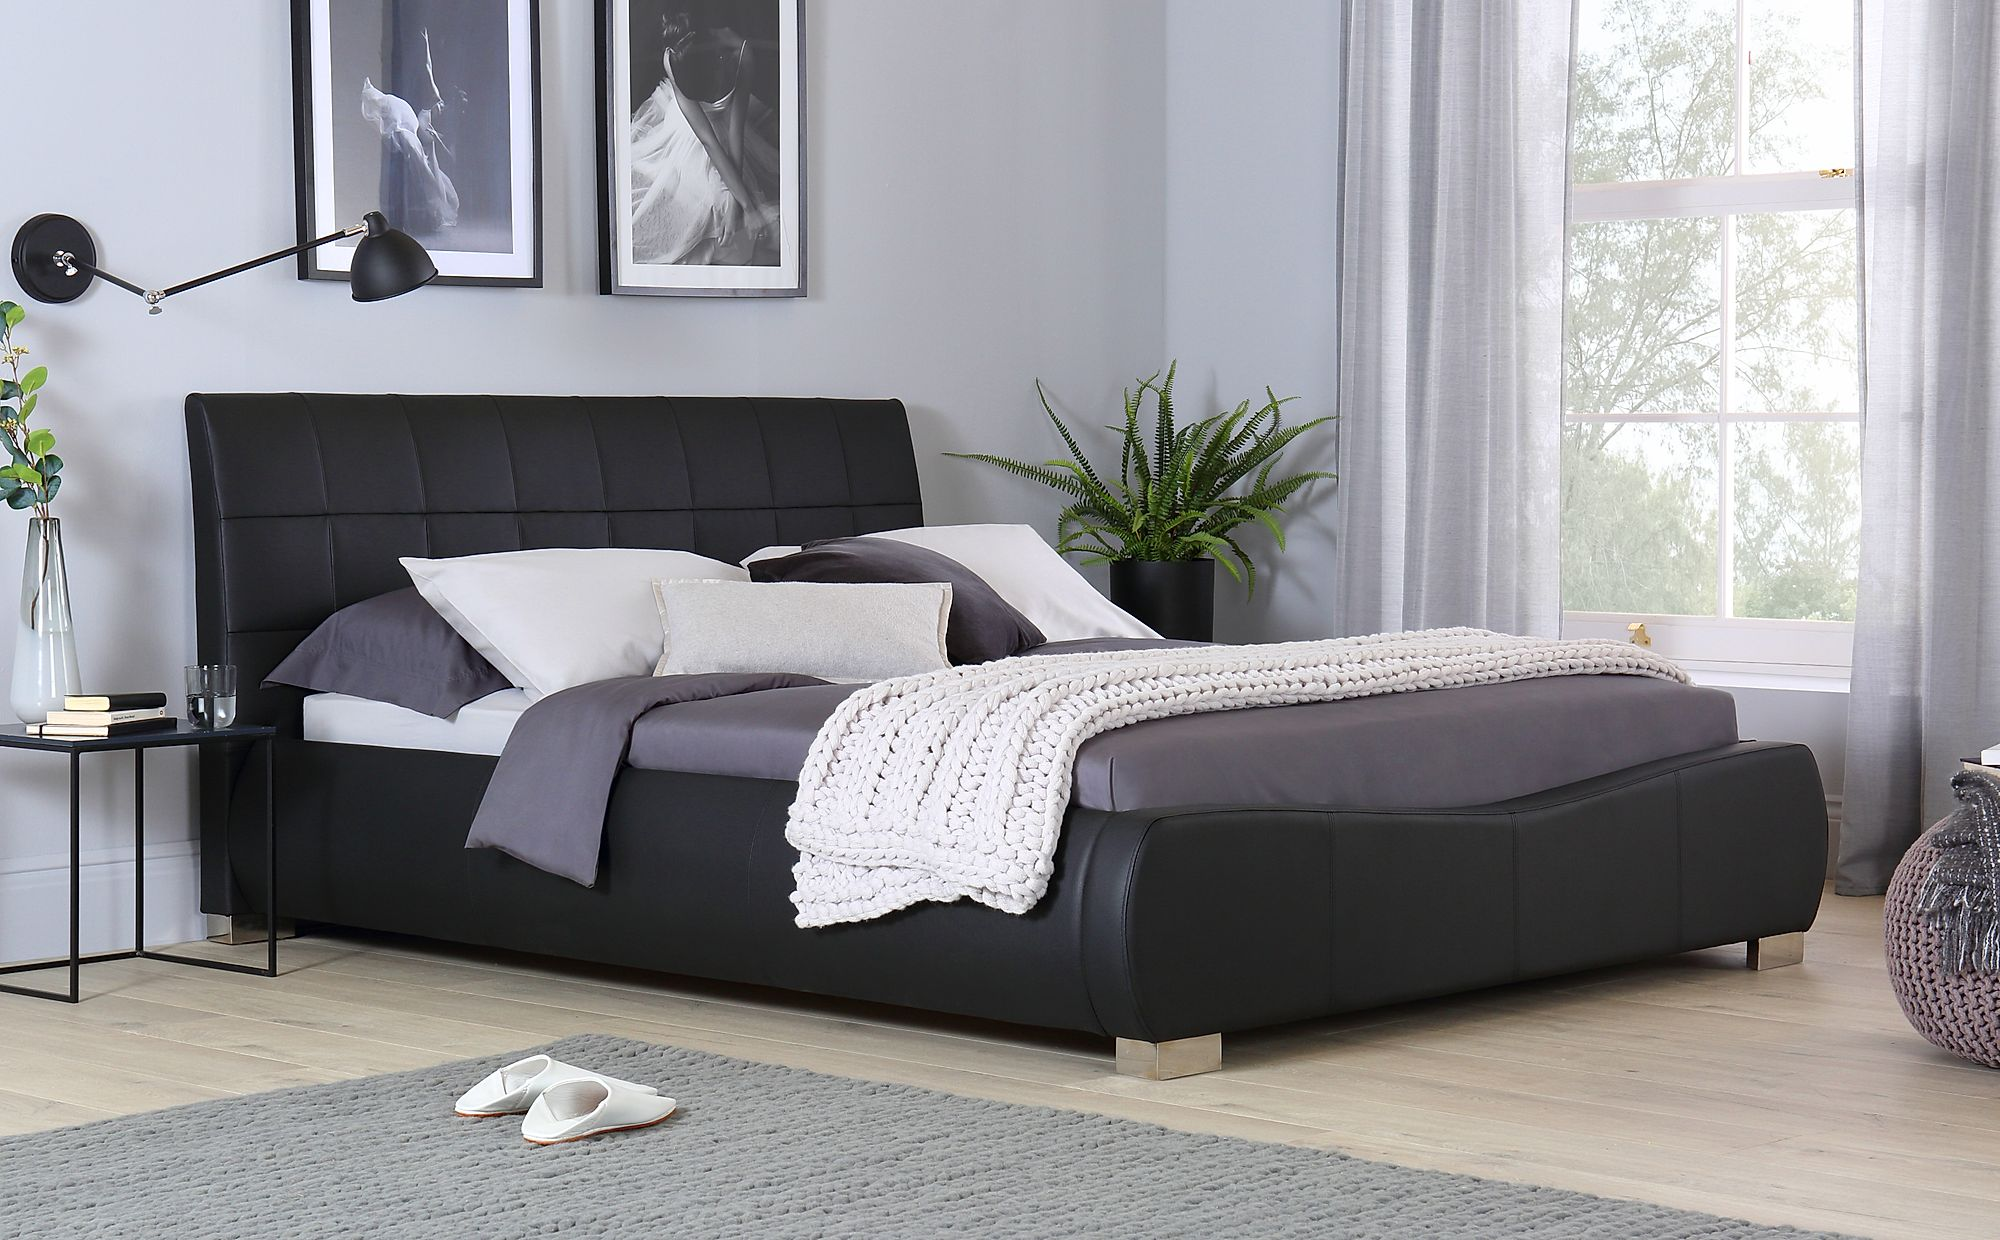 Dorado Black Leather King Size Bed Furniture Choice